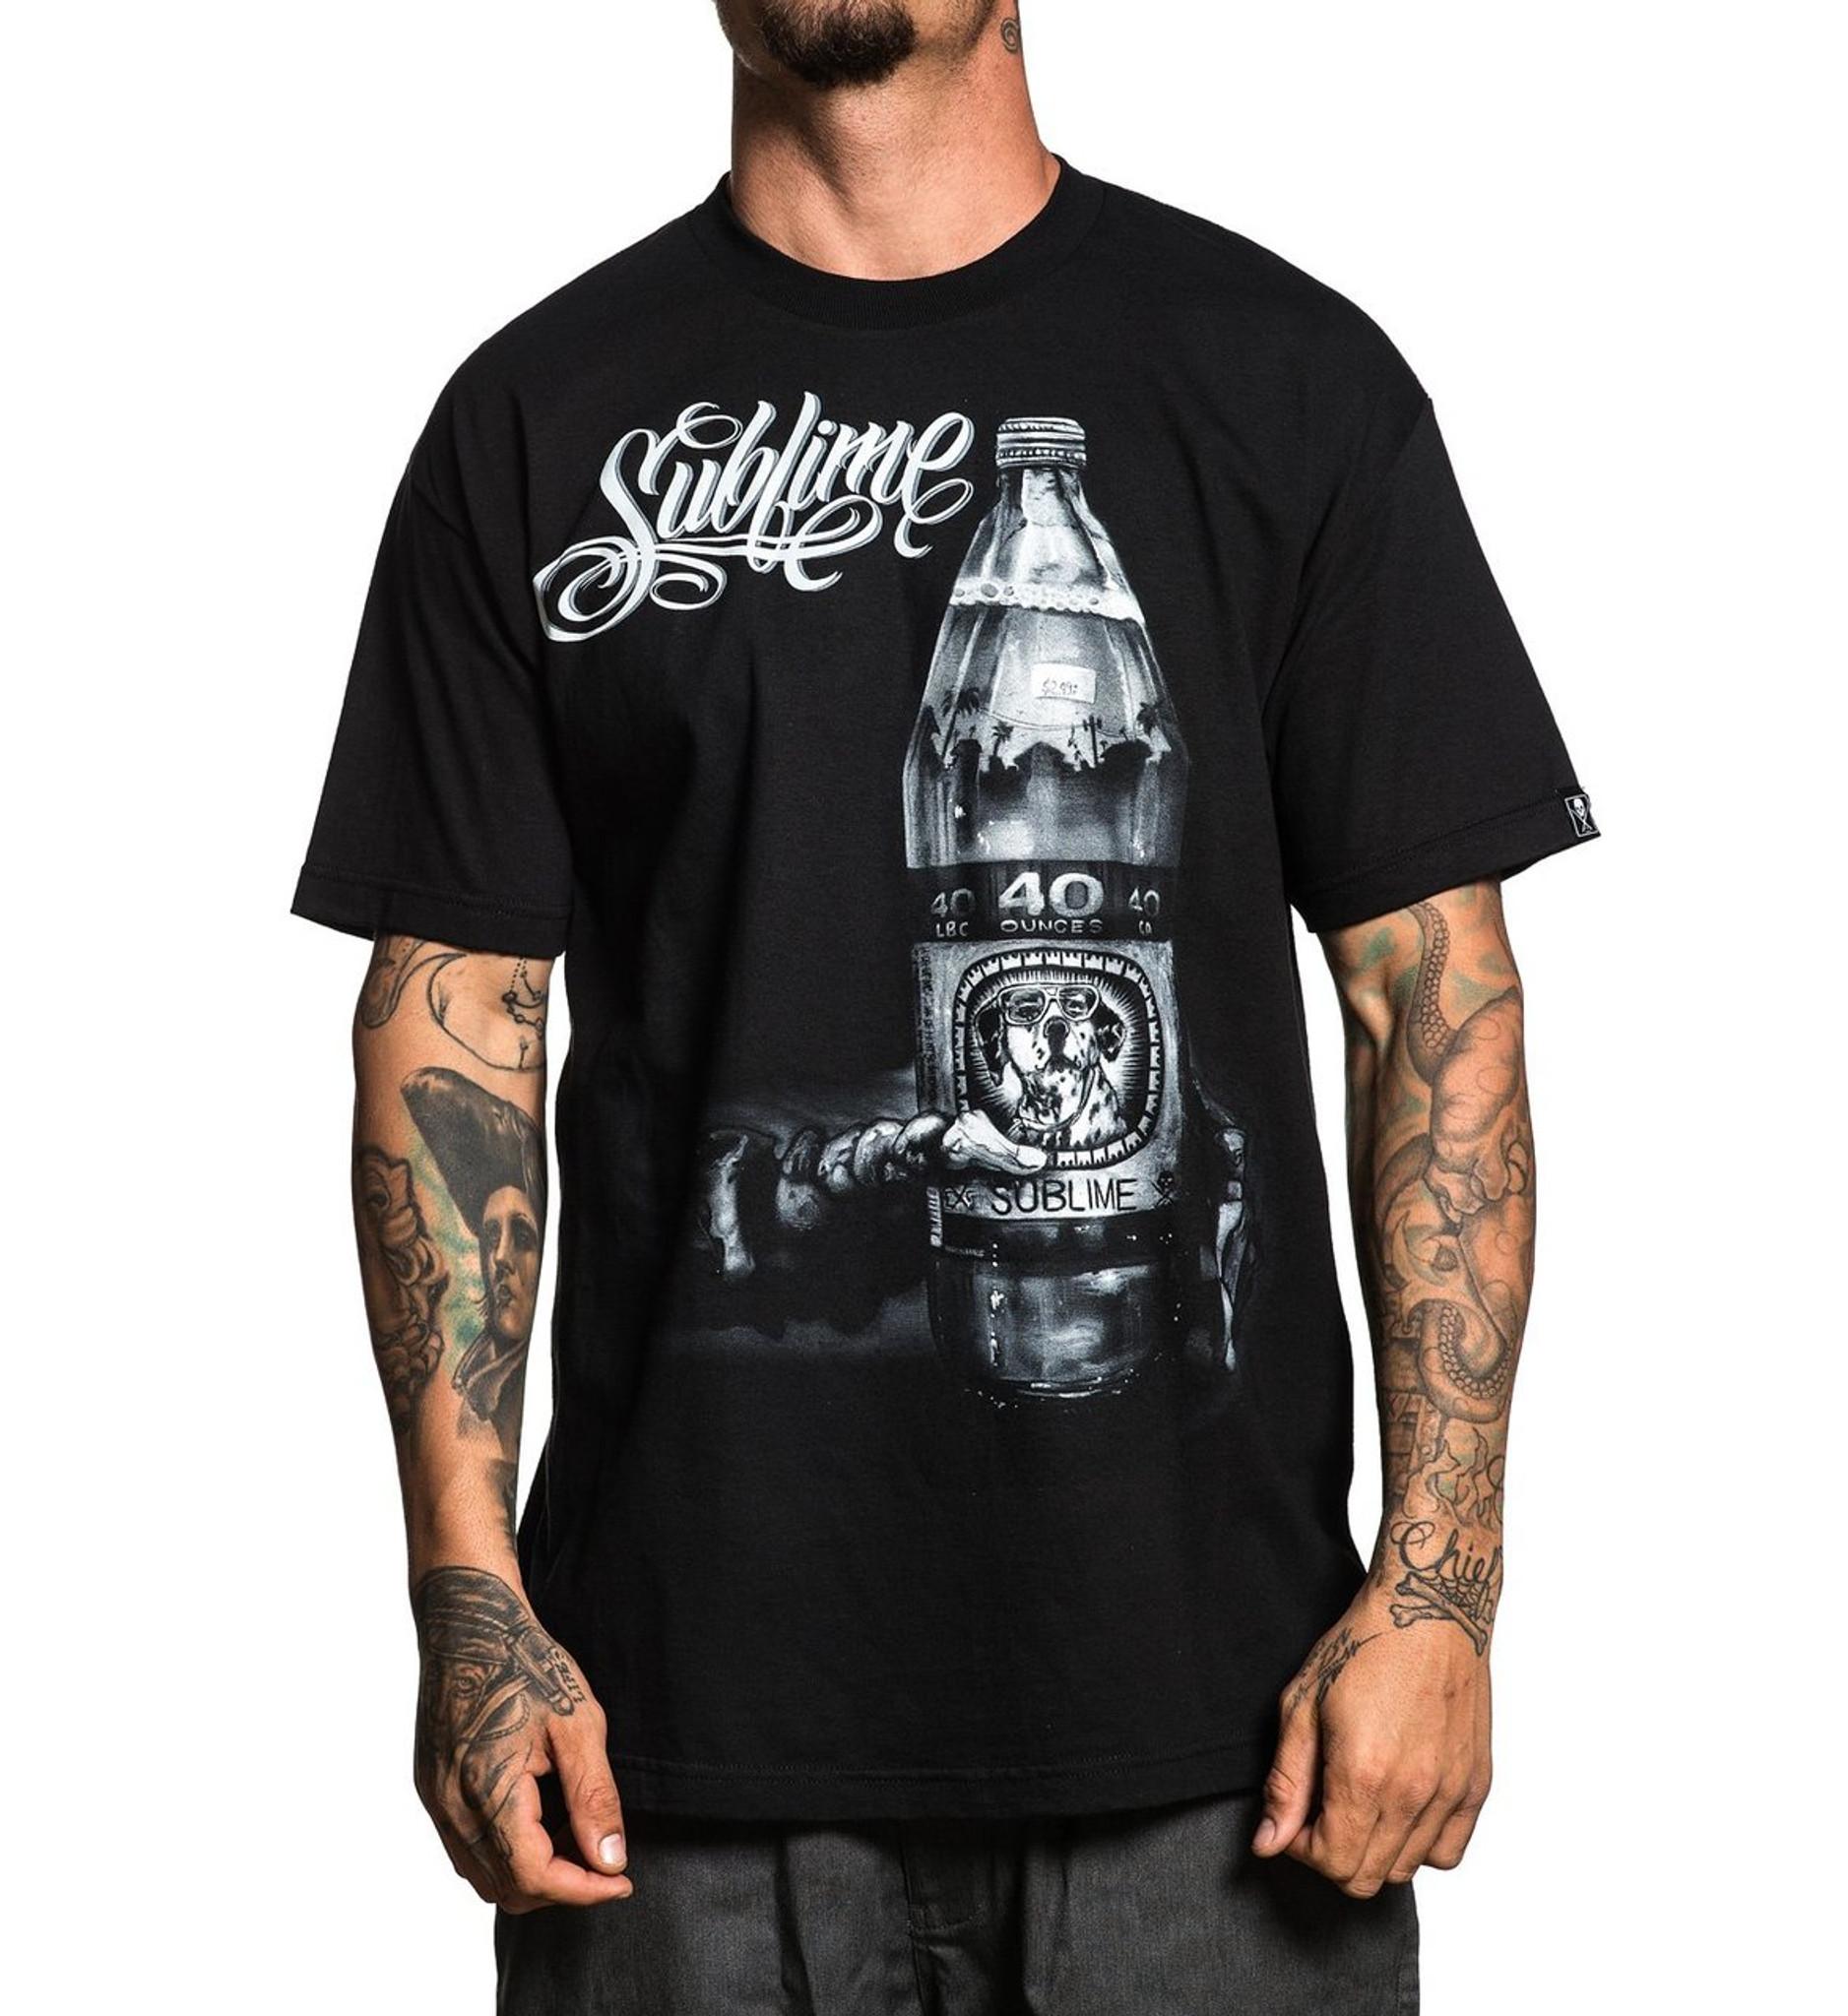 da4223a7 Sullen Sippin T-Shirt - West Coast Republic